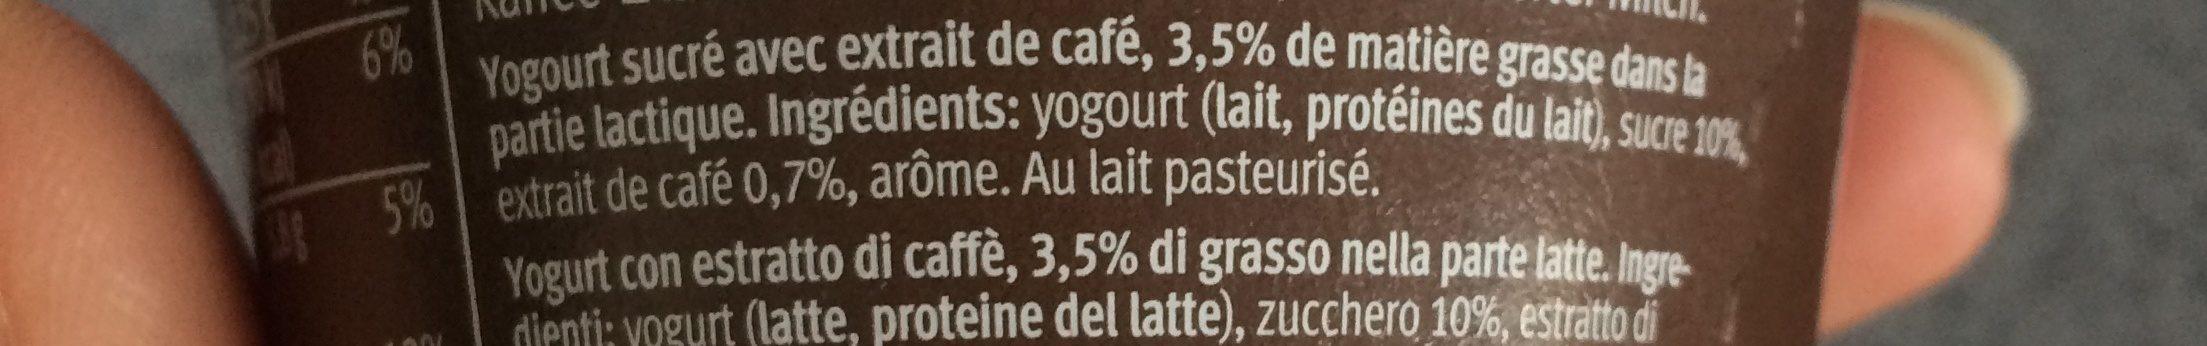 Yogurt Moca - Ingredienti - fr